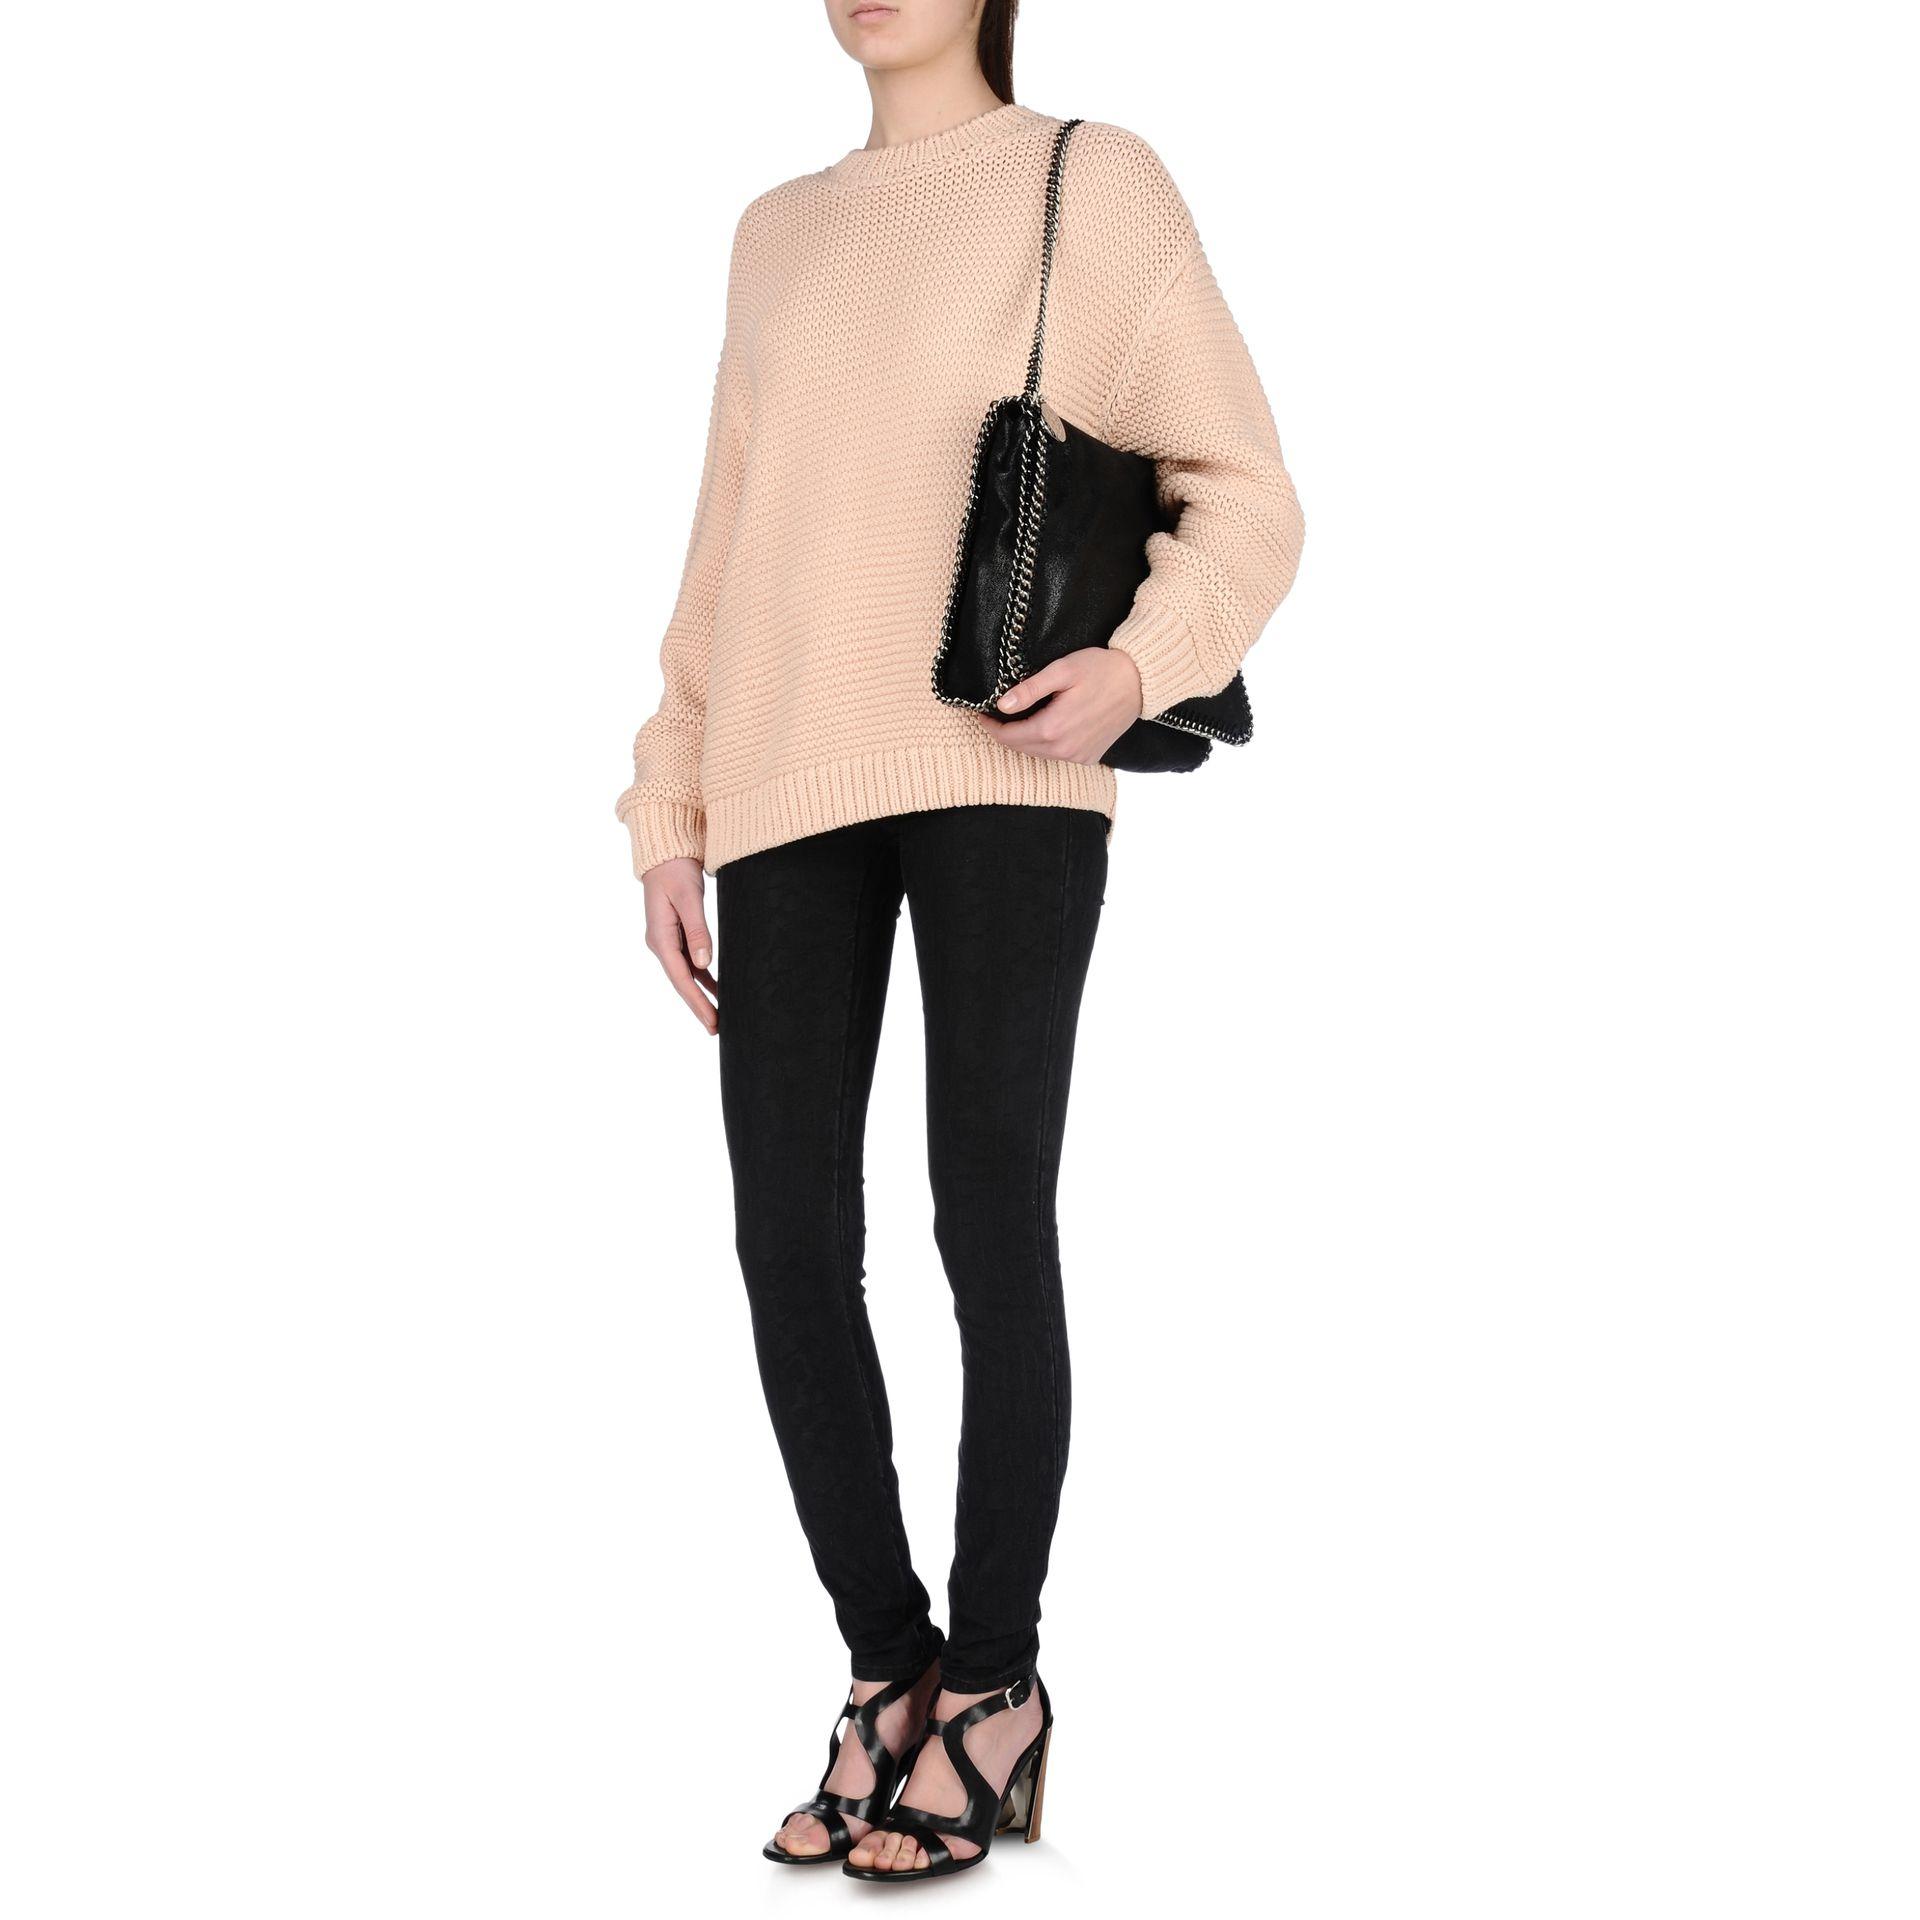 Shaggy Deer Falabella Shoulder Bag in Black Eco Leather Stella McCartney YwcdxD